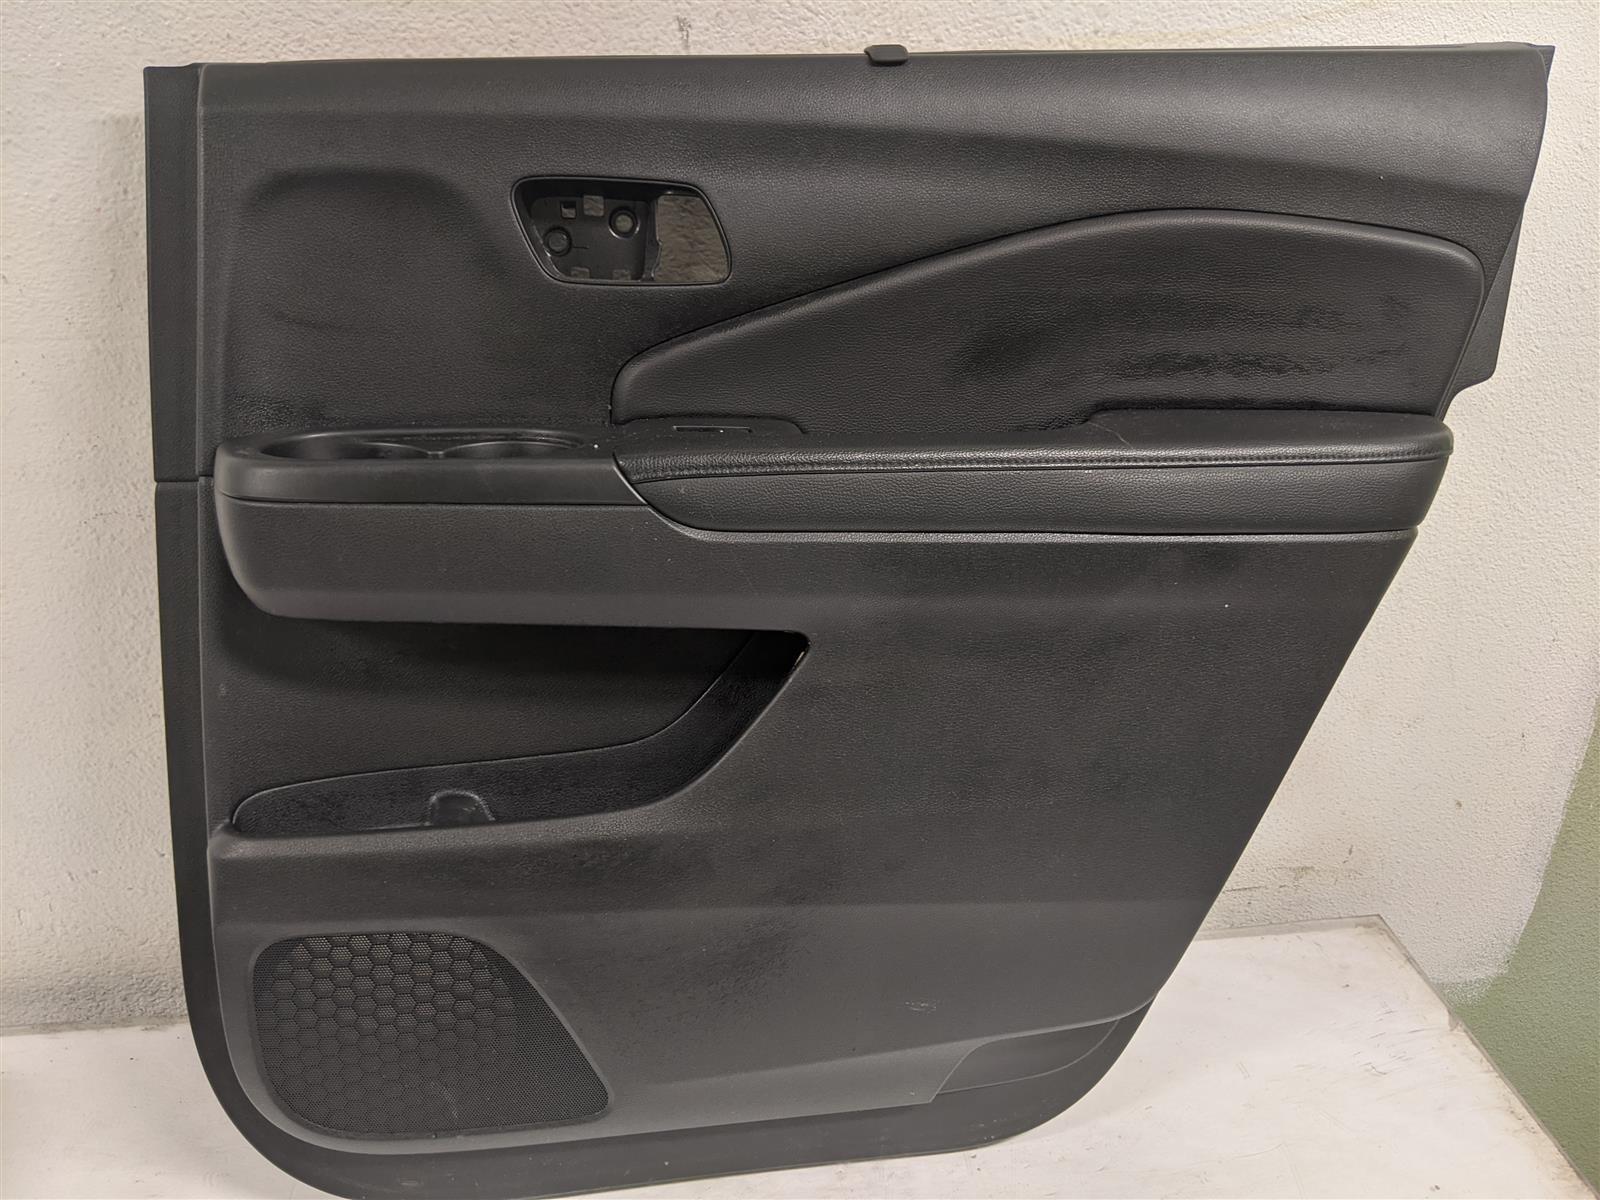 2017 Honda Pilot Rear Passenger Door Panel Black, Sunshade Replacement